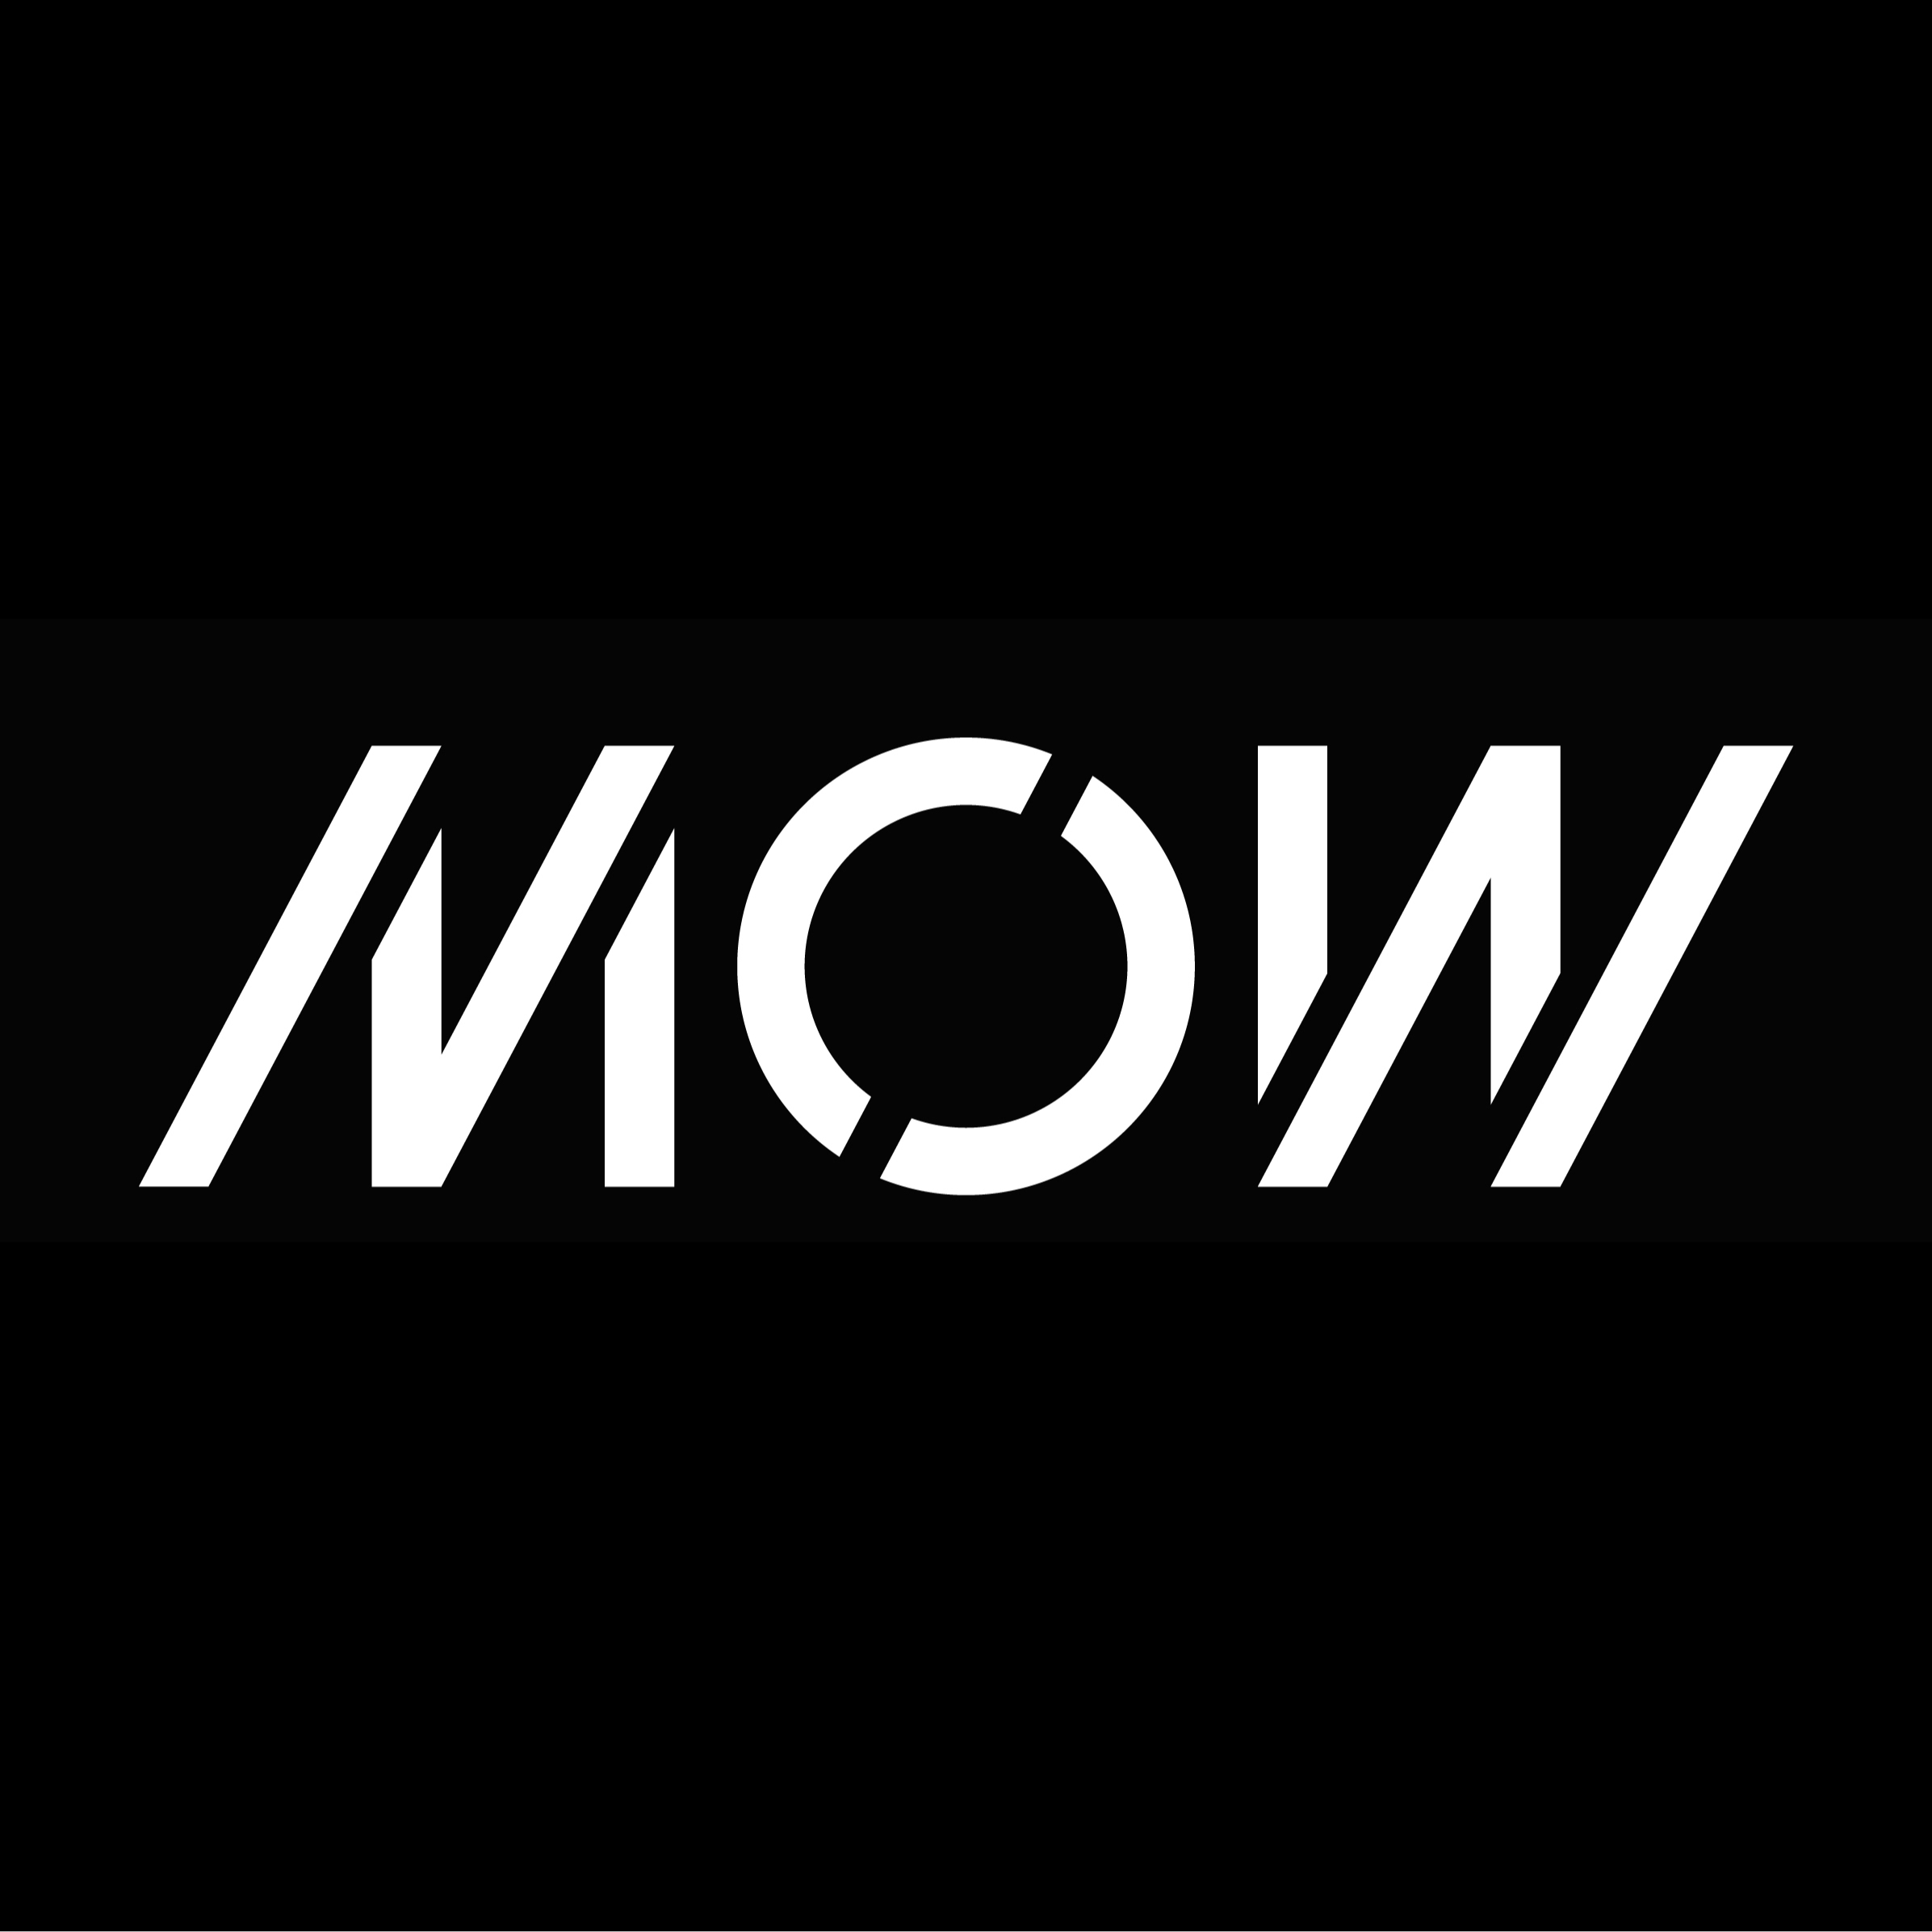 Mow Square.jpg